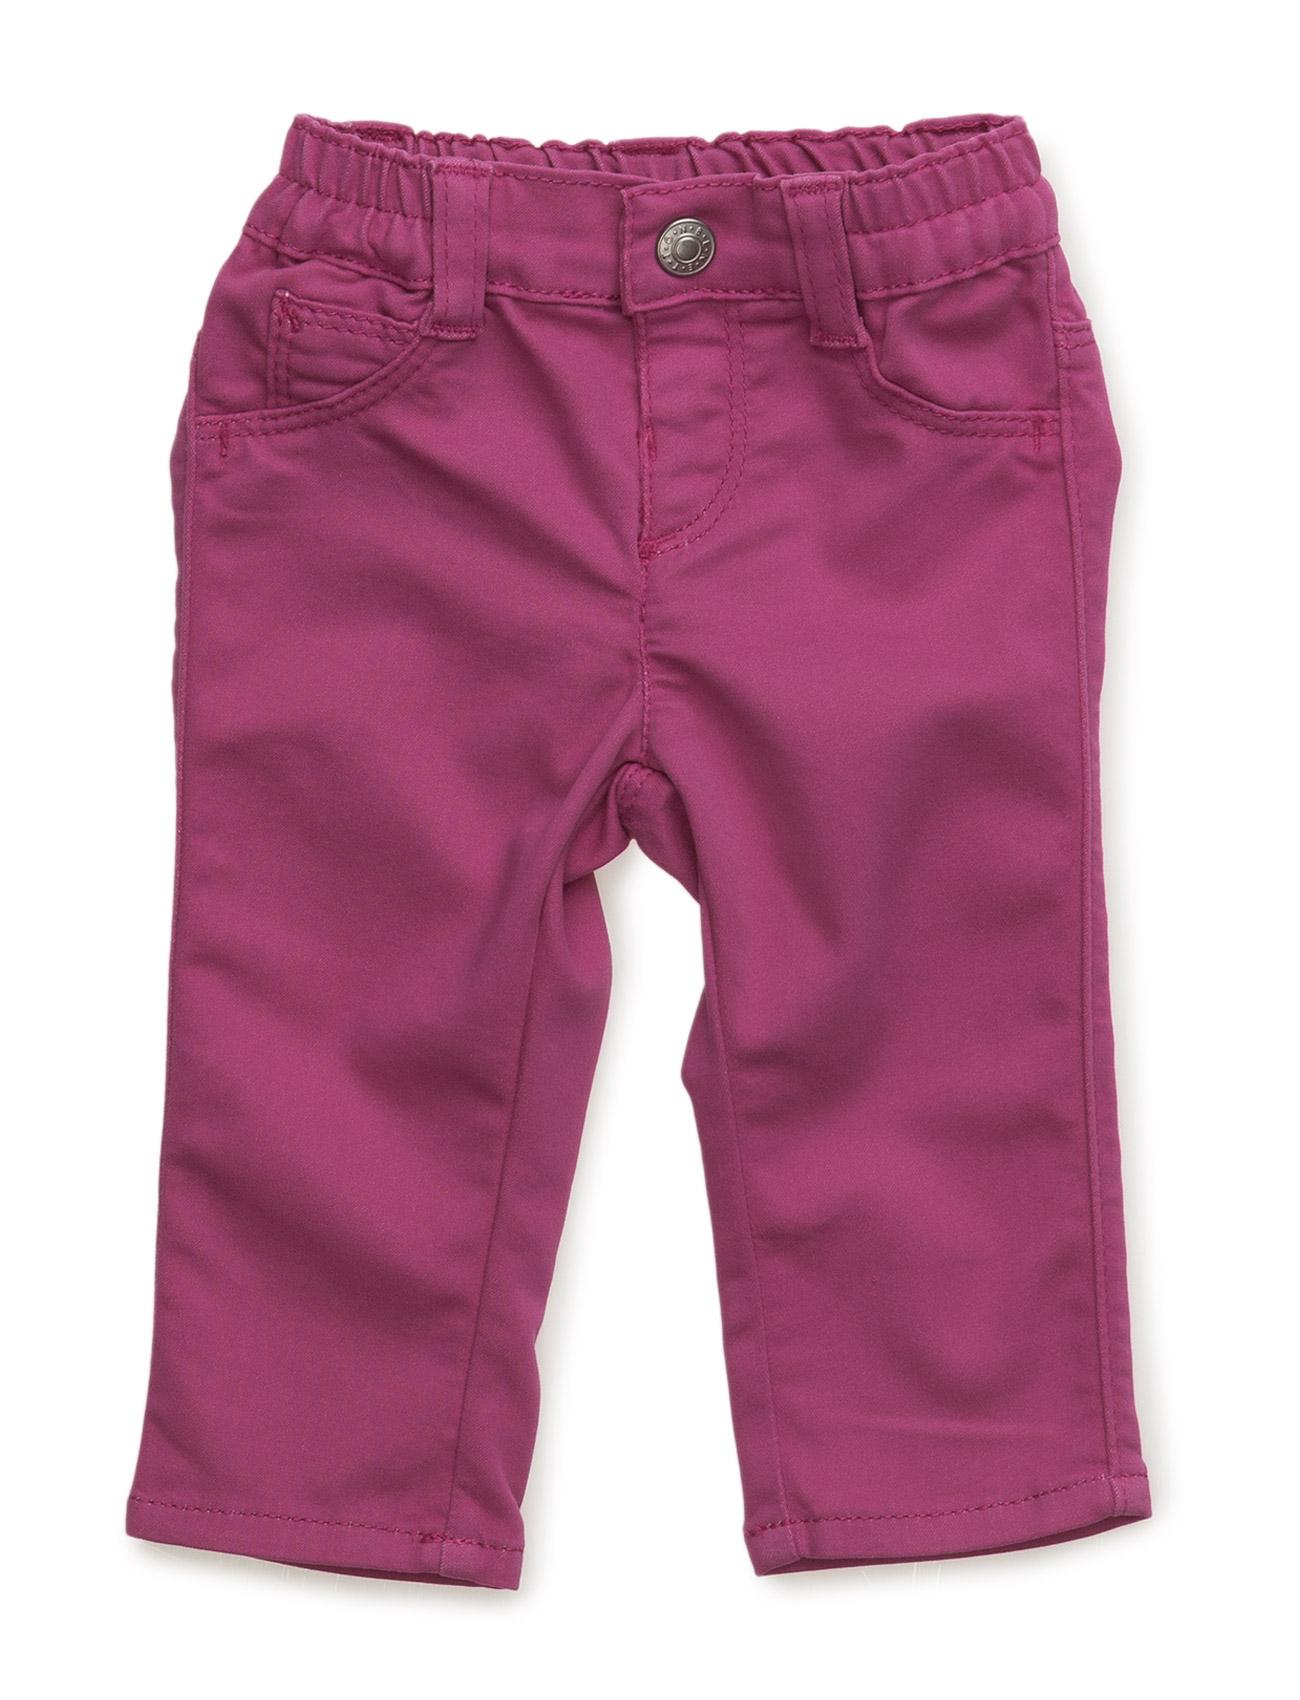 Trousers United Colors of Benetton  til Børn i Lyserød